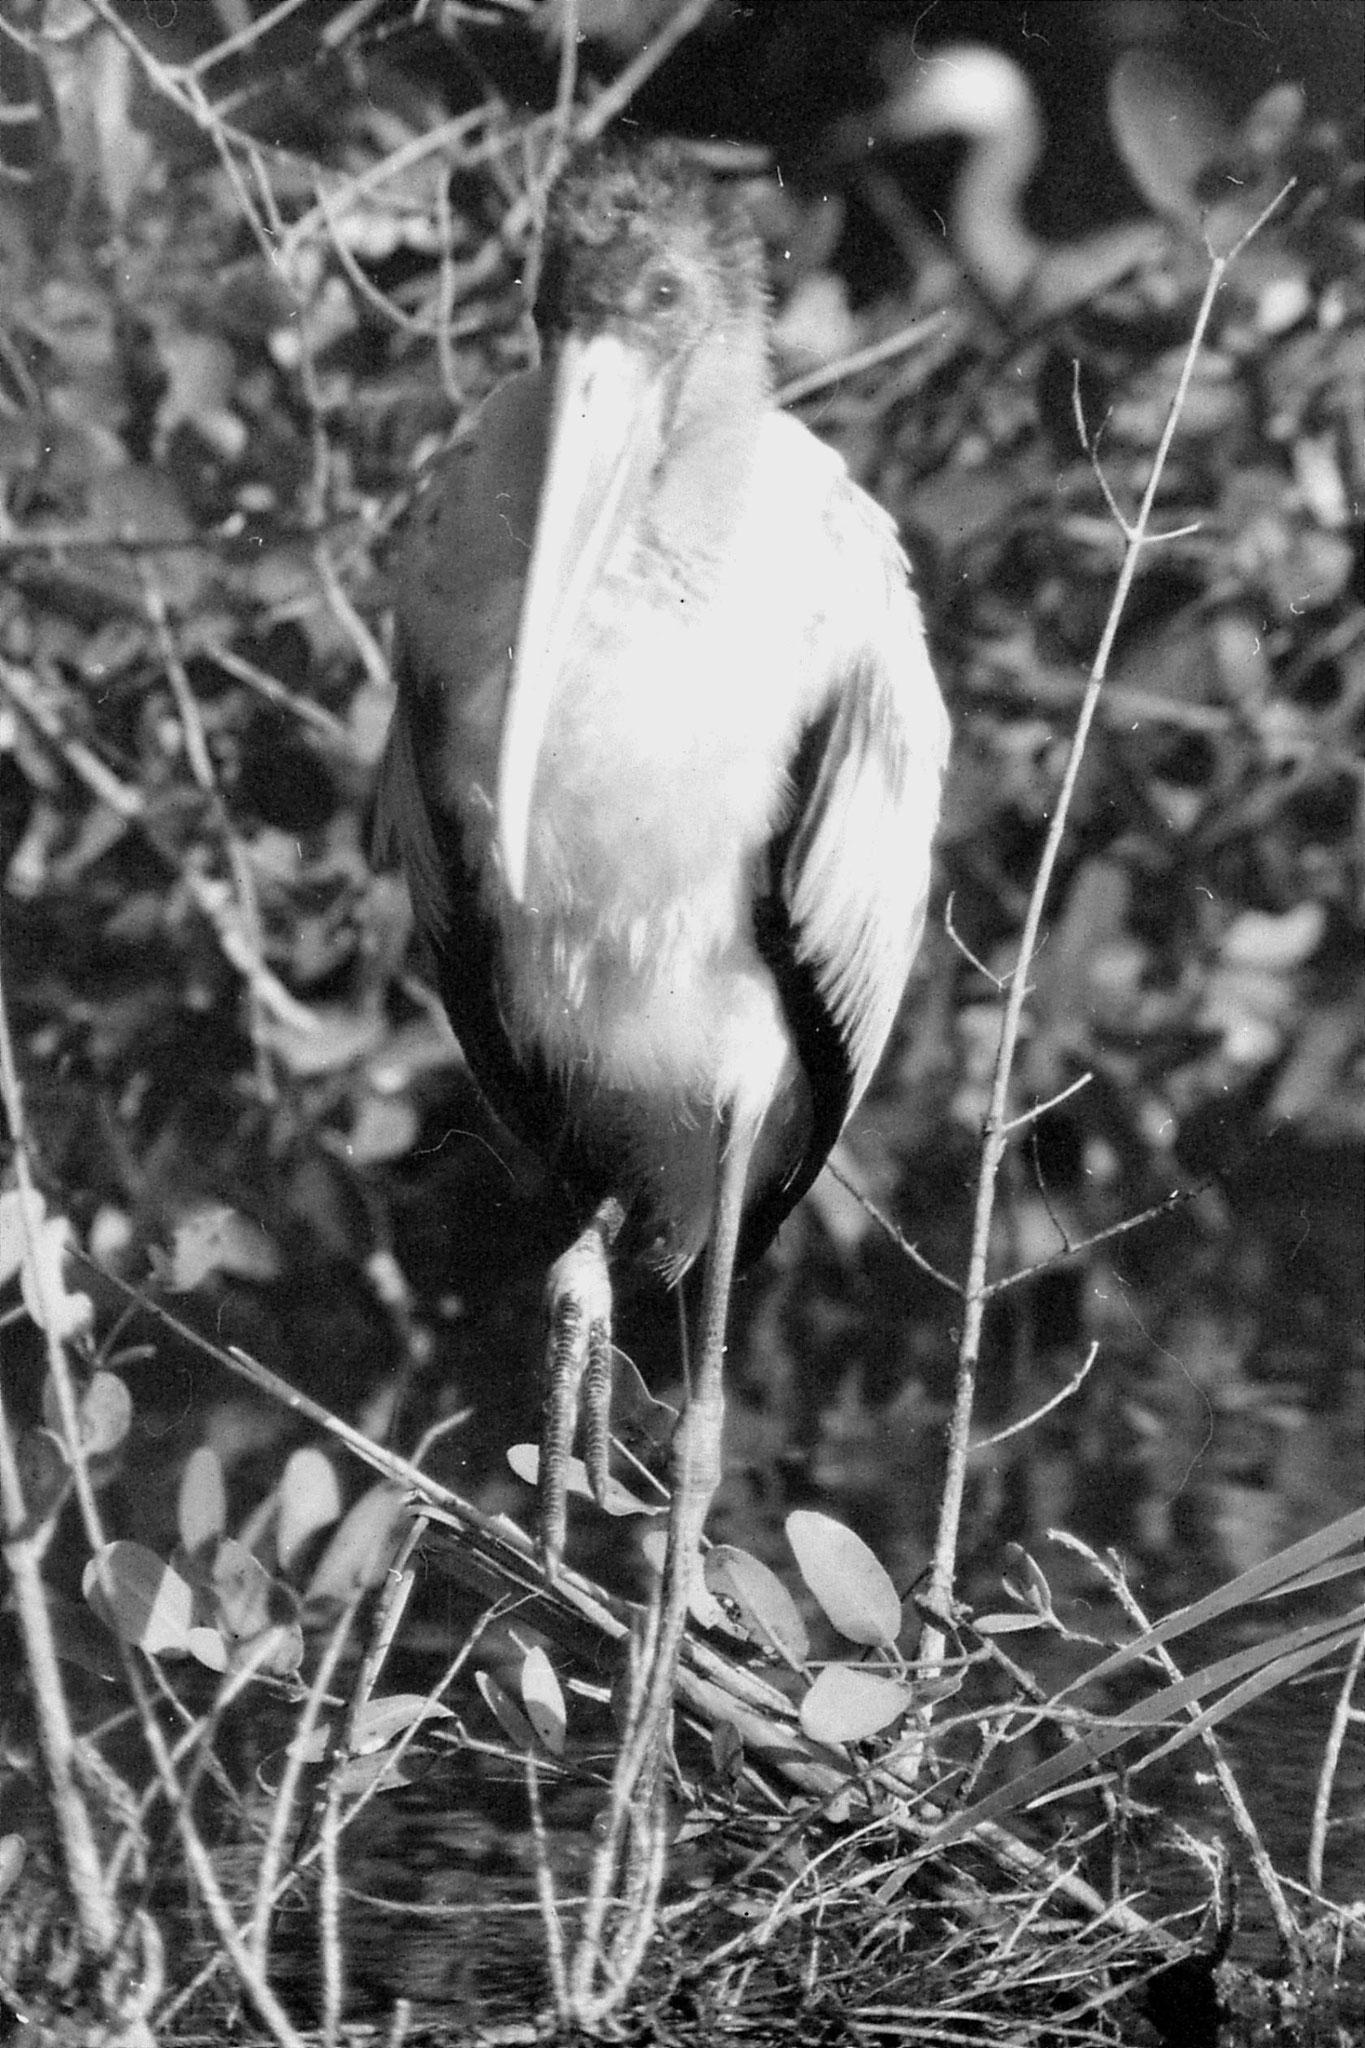 21/12/1990: 13: Everglades